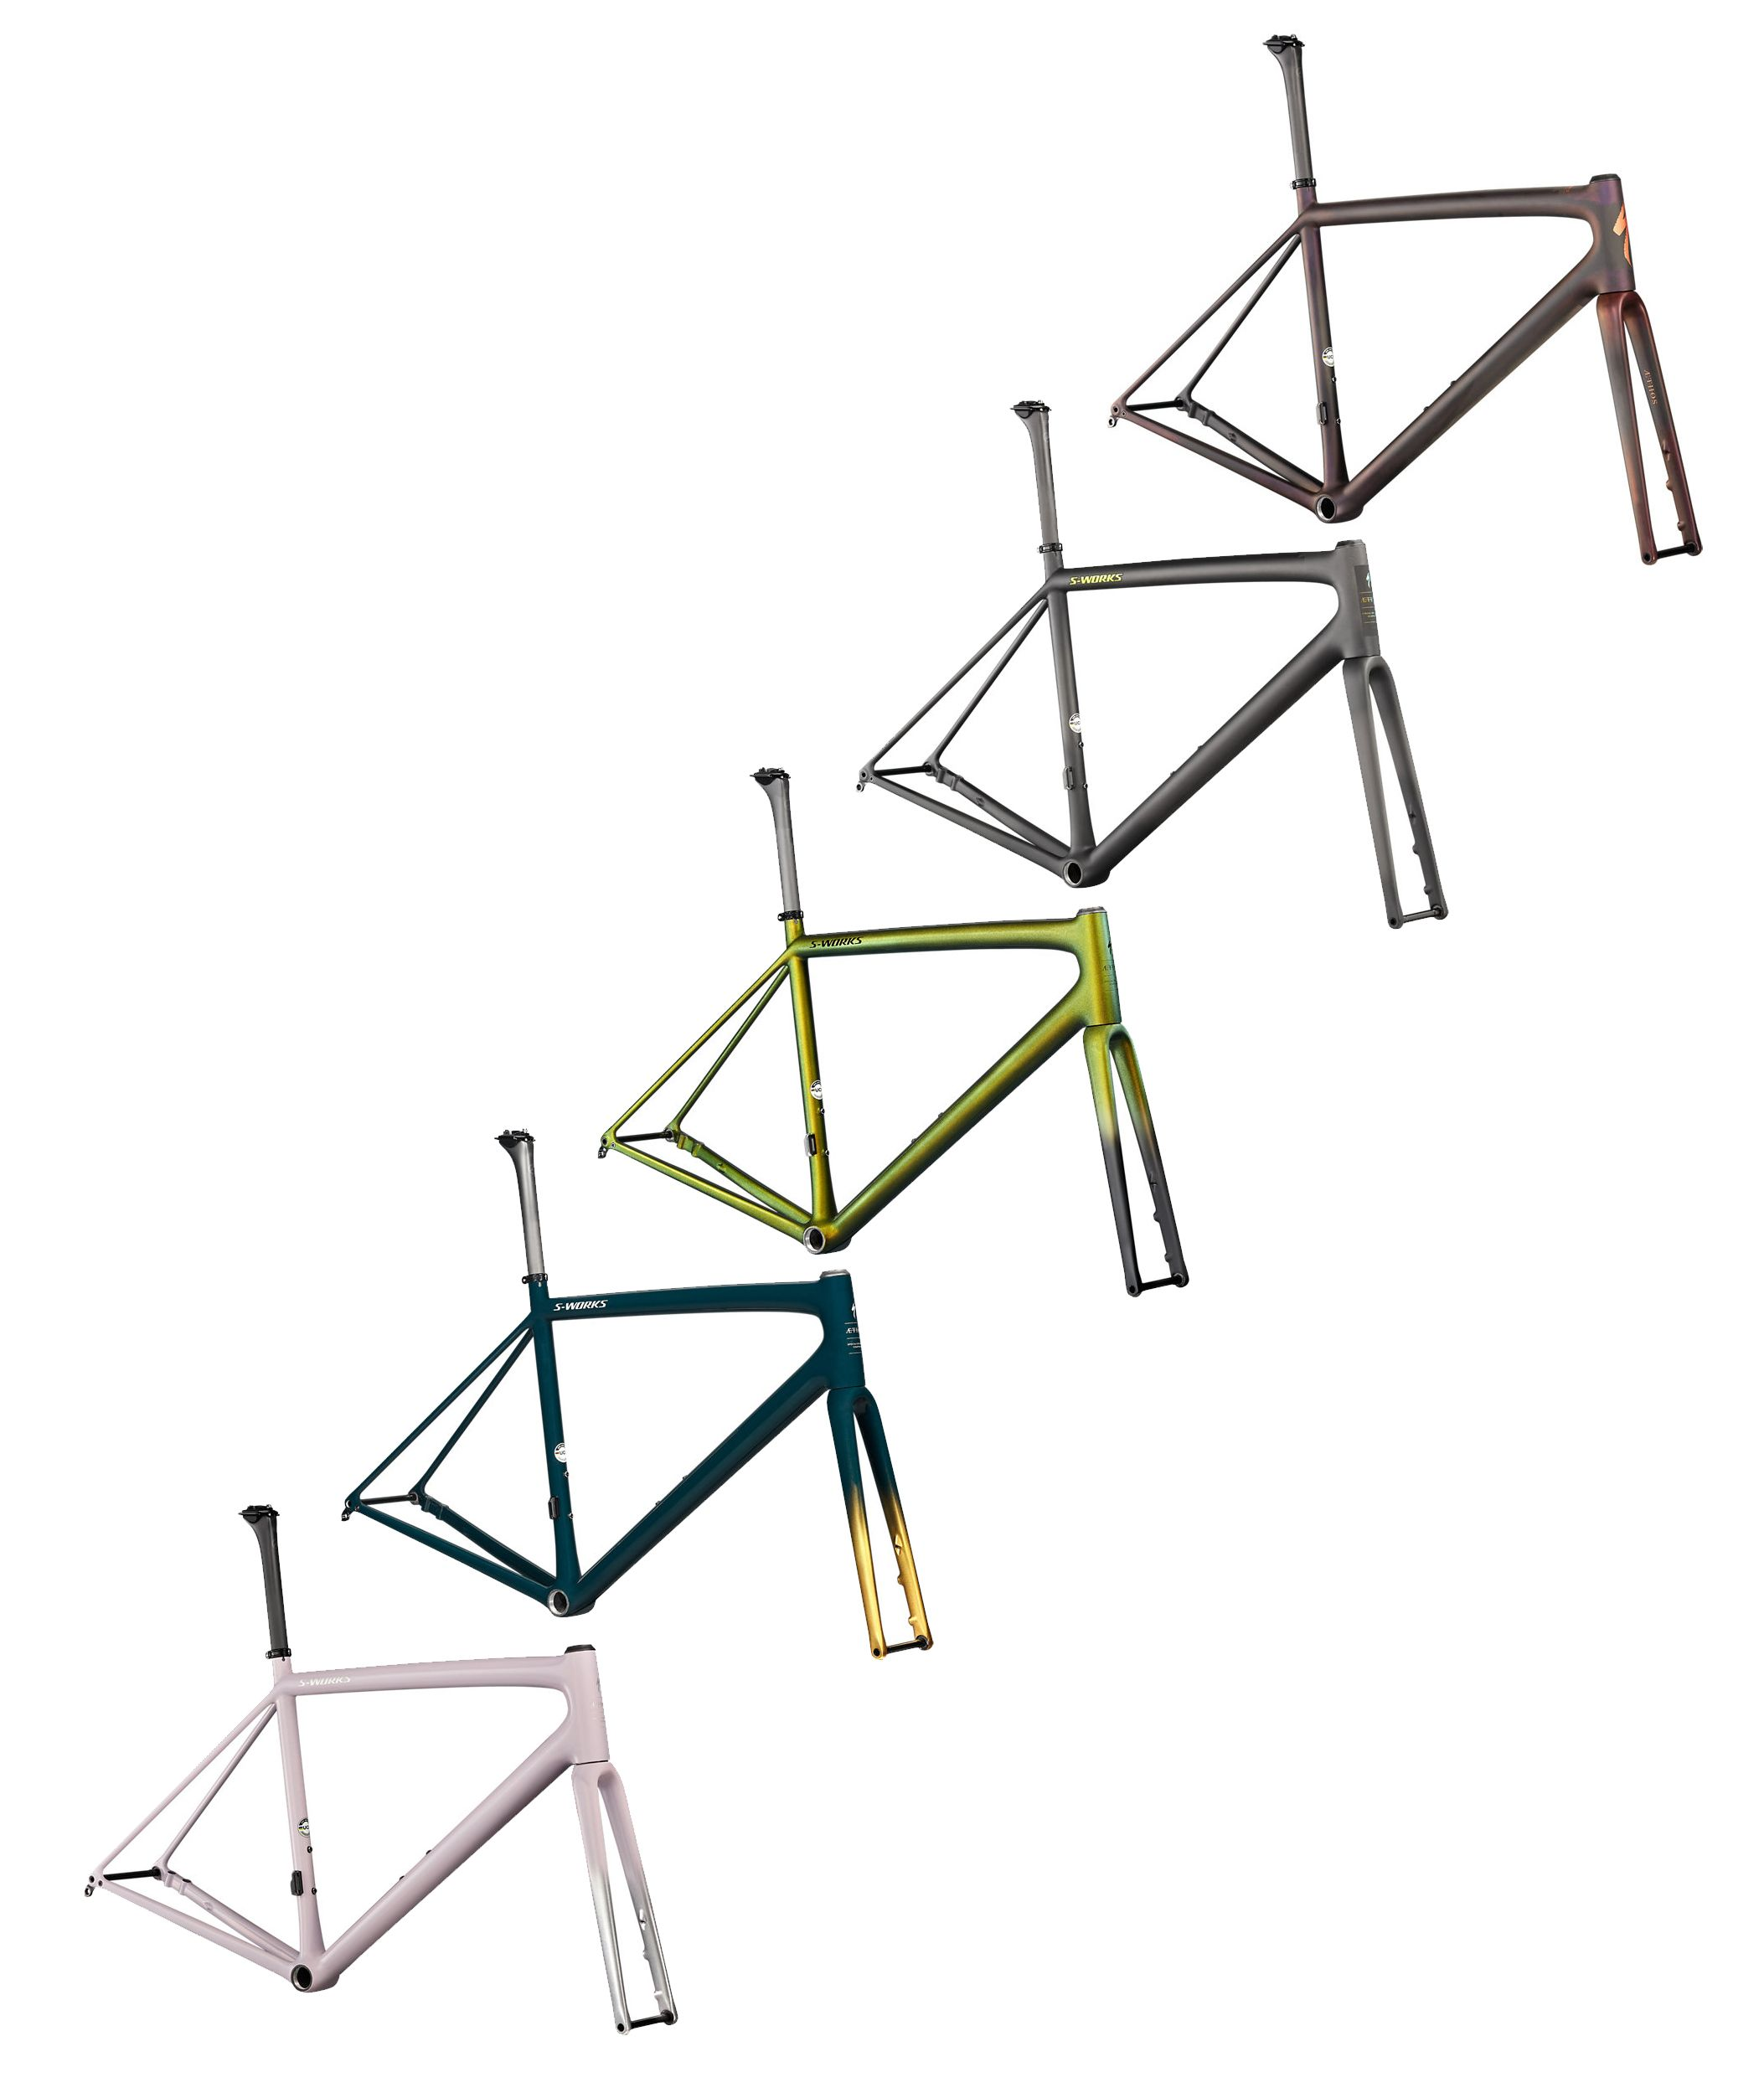 Specialized S-Works Aethos Frameset | bike frame